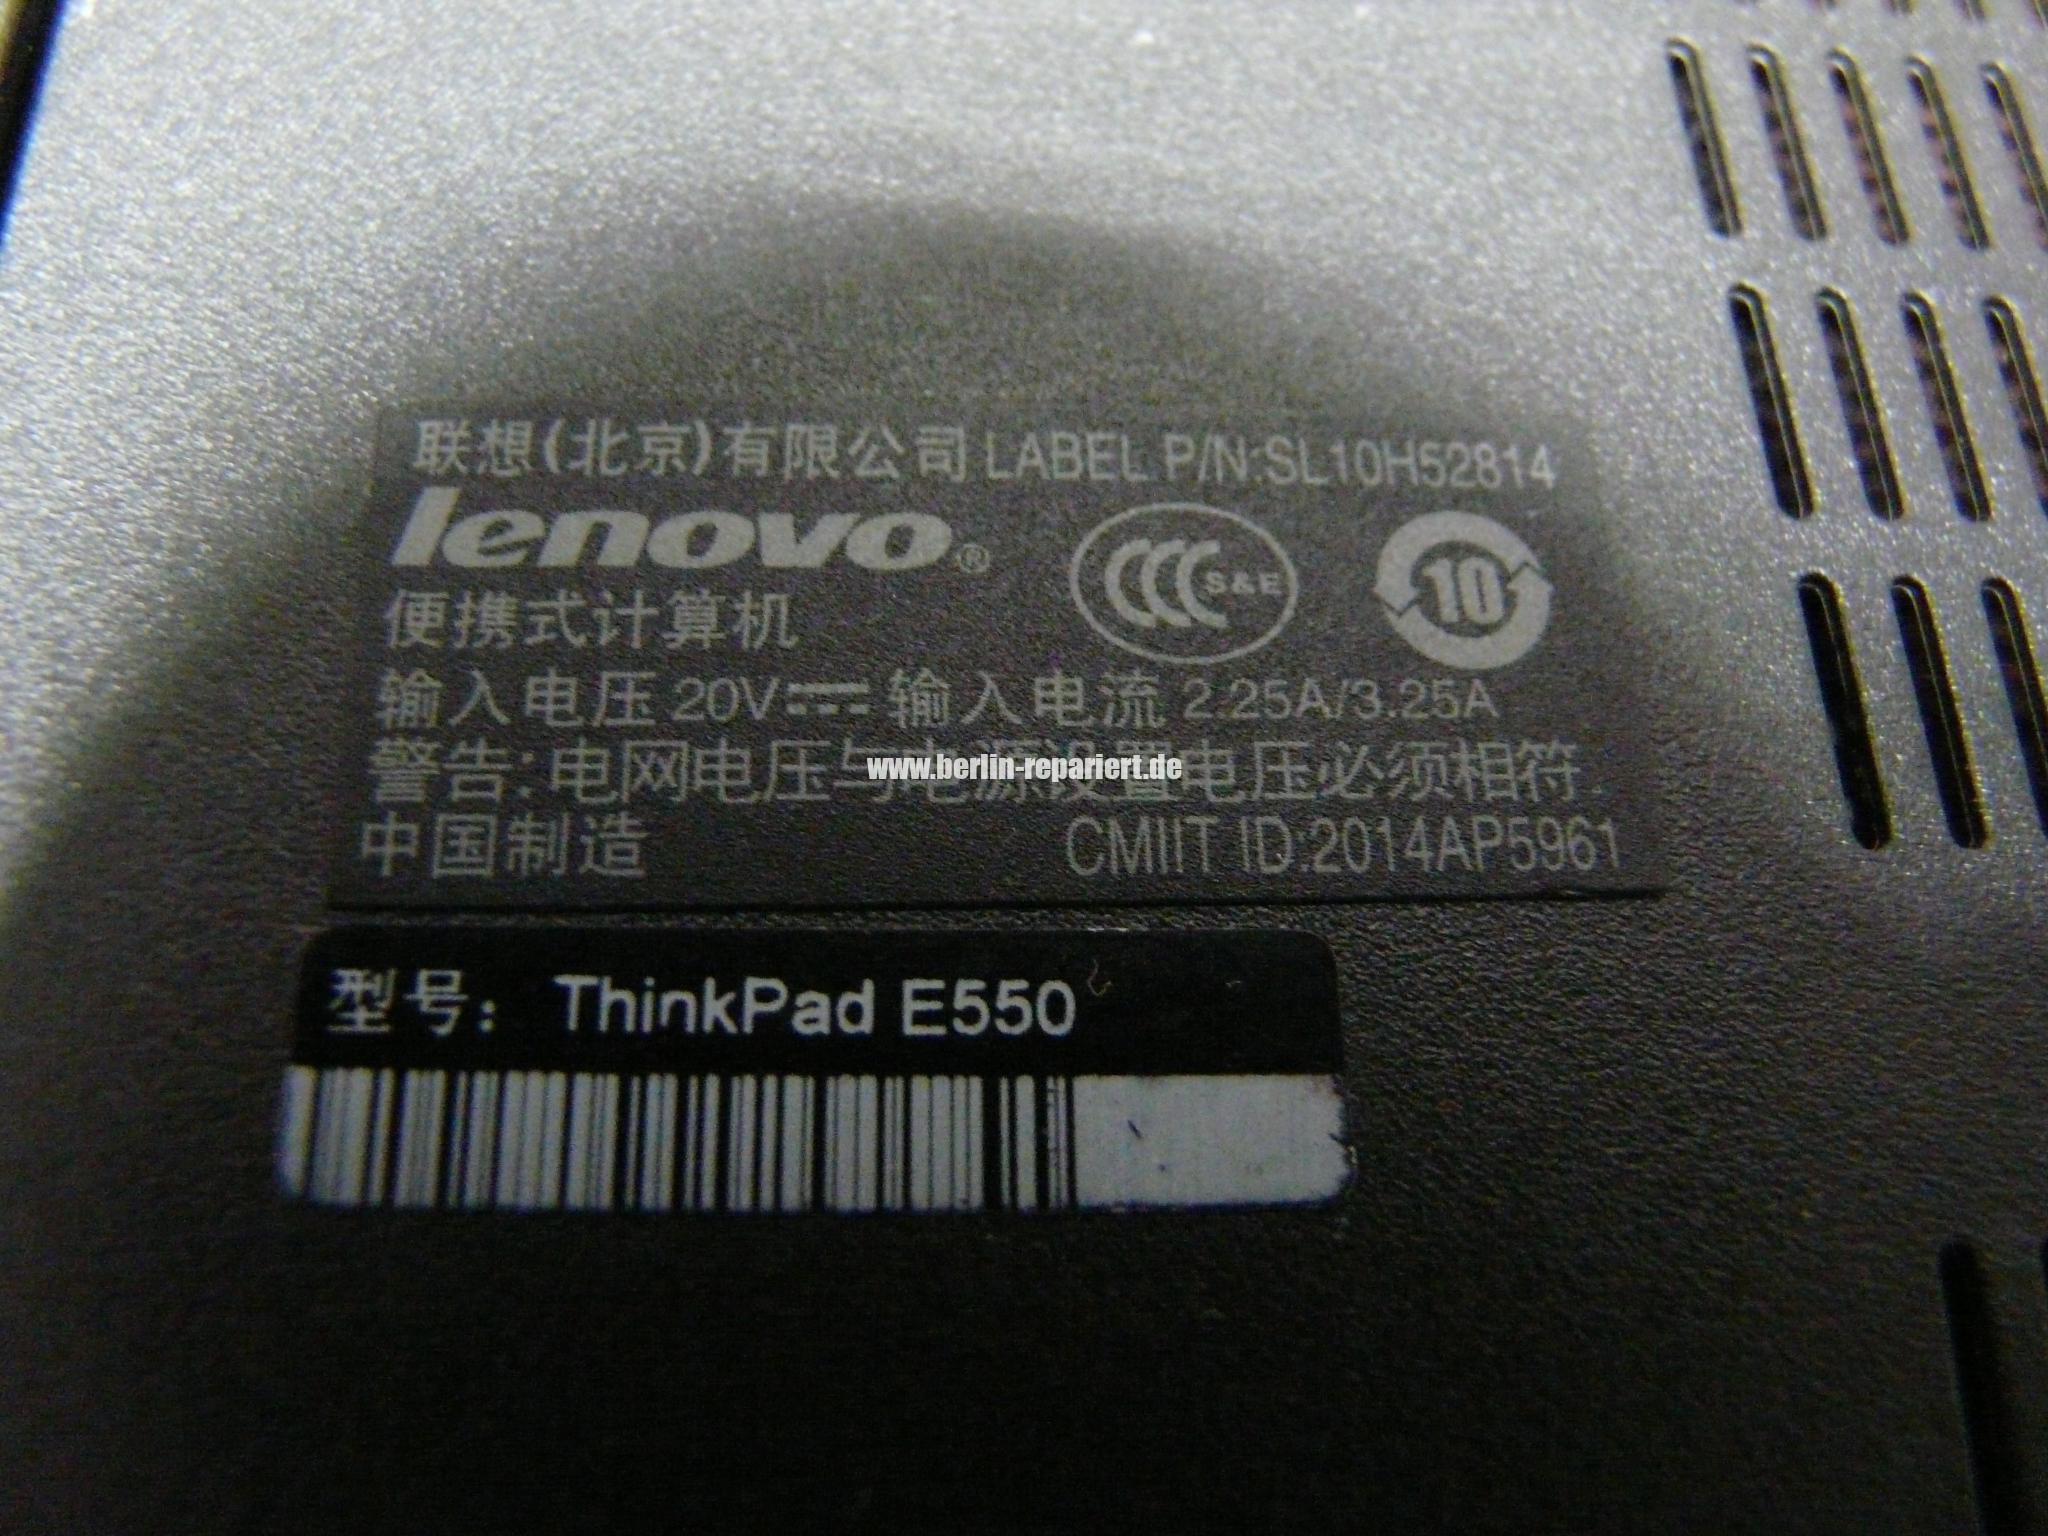 Linked-lock Nicht Geht Lenovo An Thinkpad that